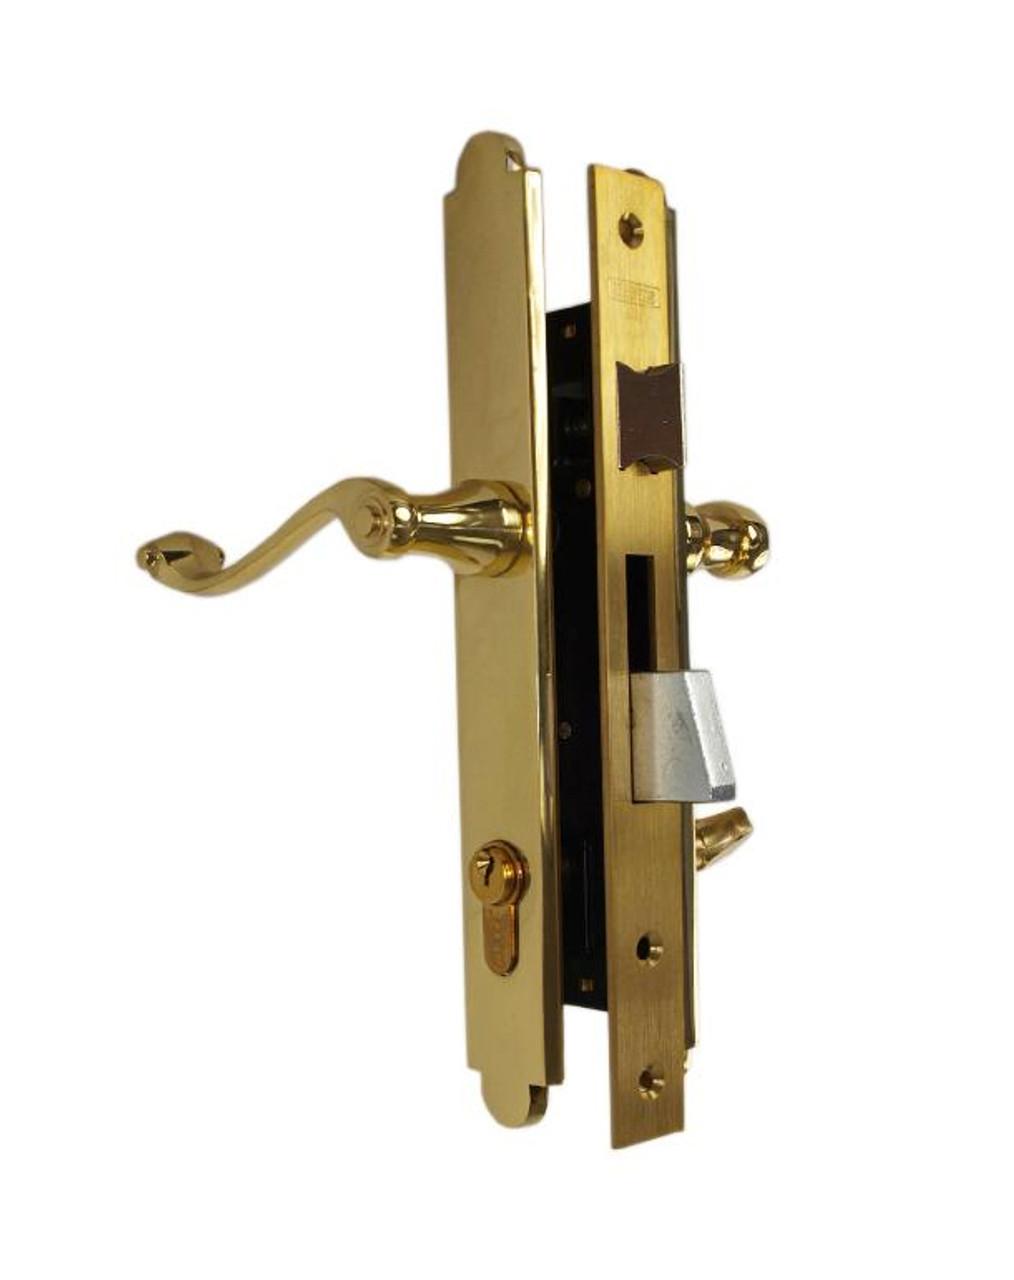 Marks Lock Thinline Mortise Lockset 2750 Series Storm